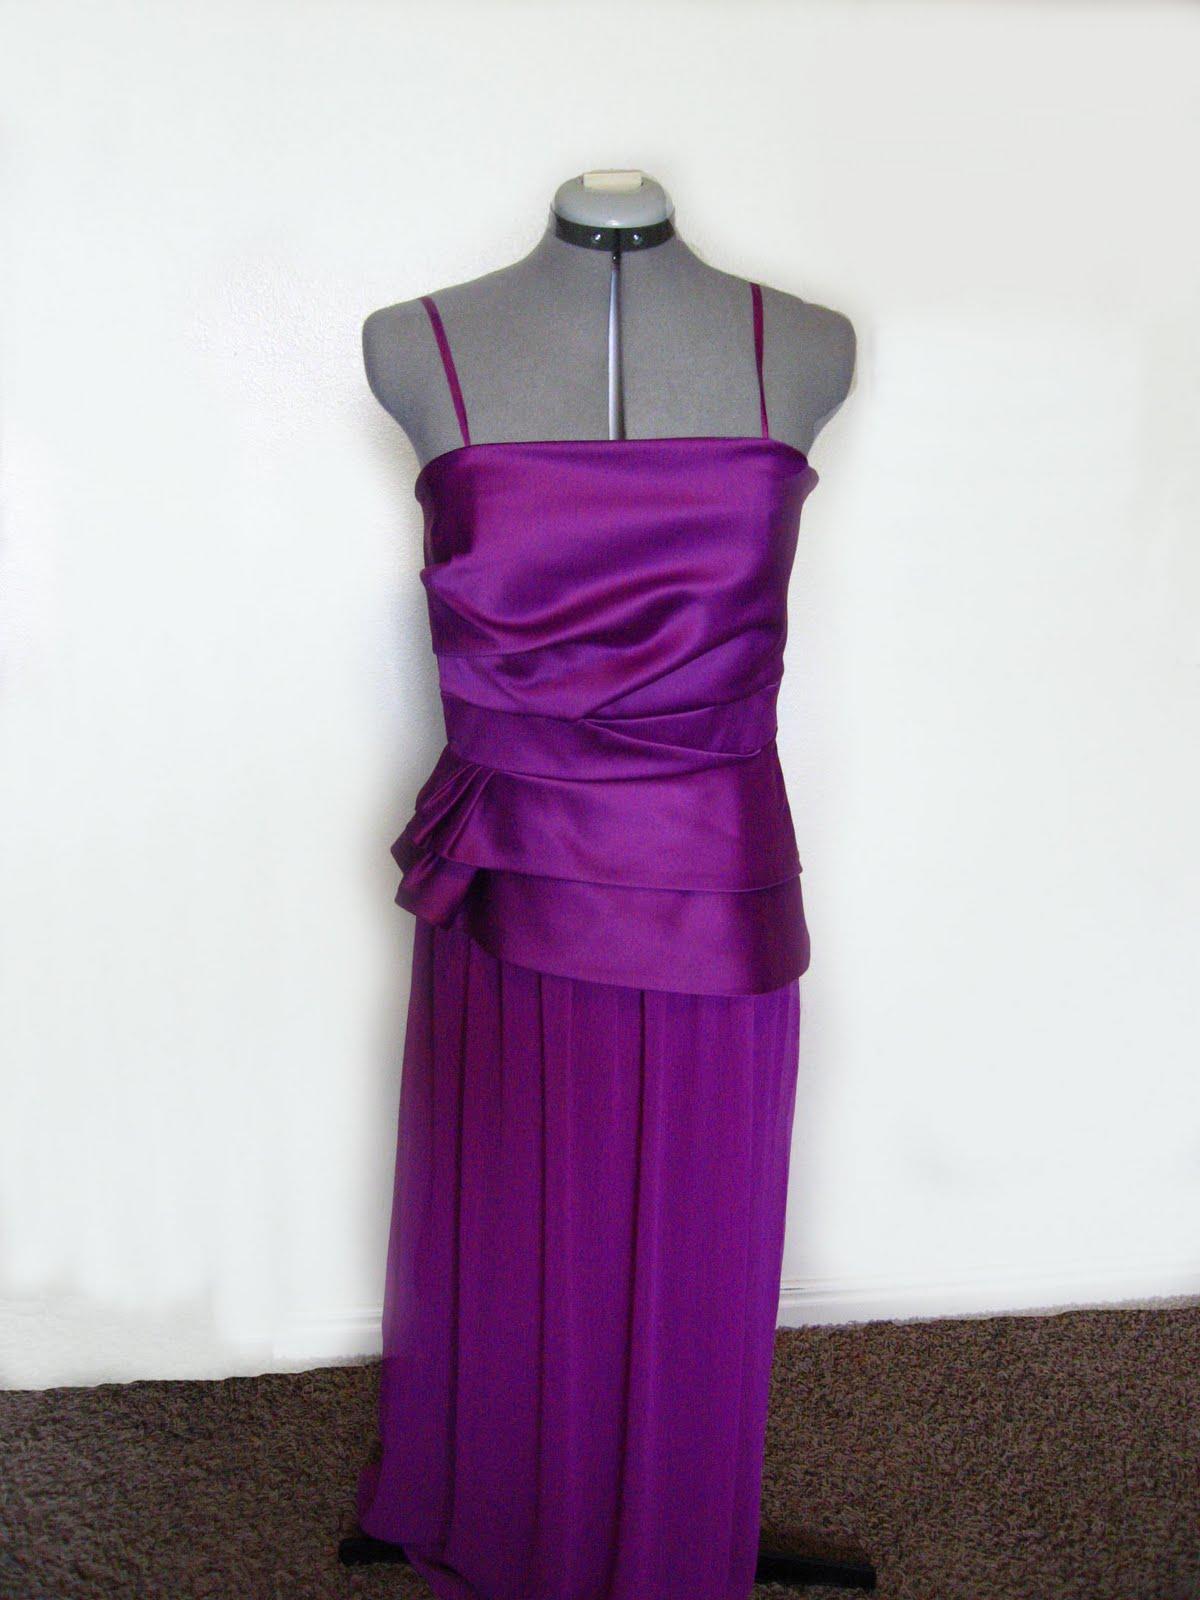 The Prom Dress (a mini tutorial) - Shwin and Shwin